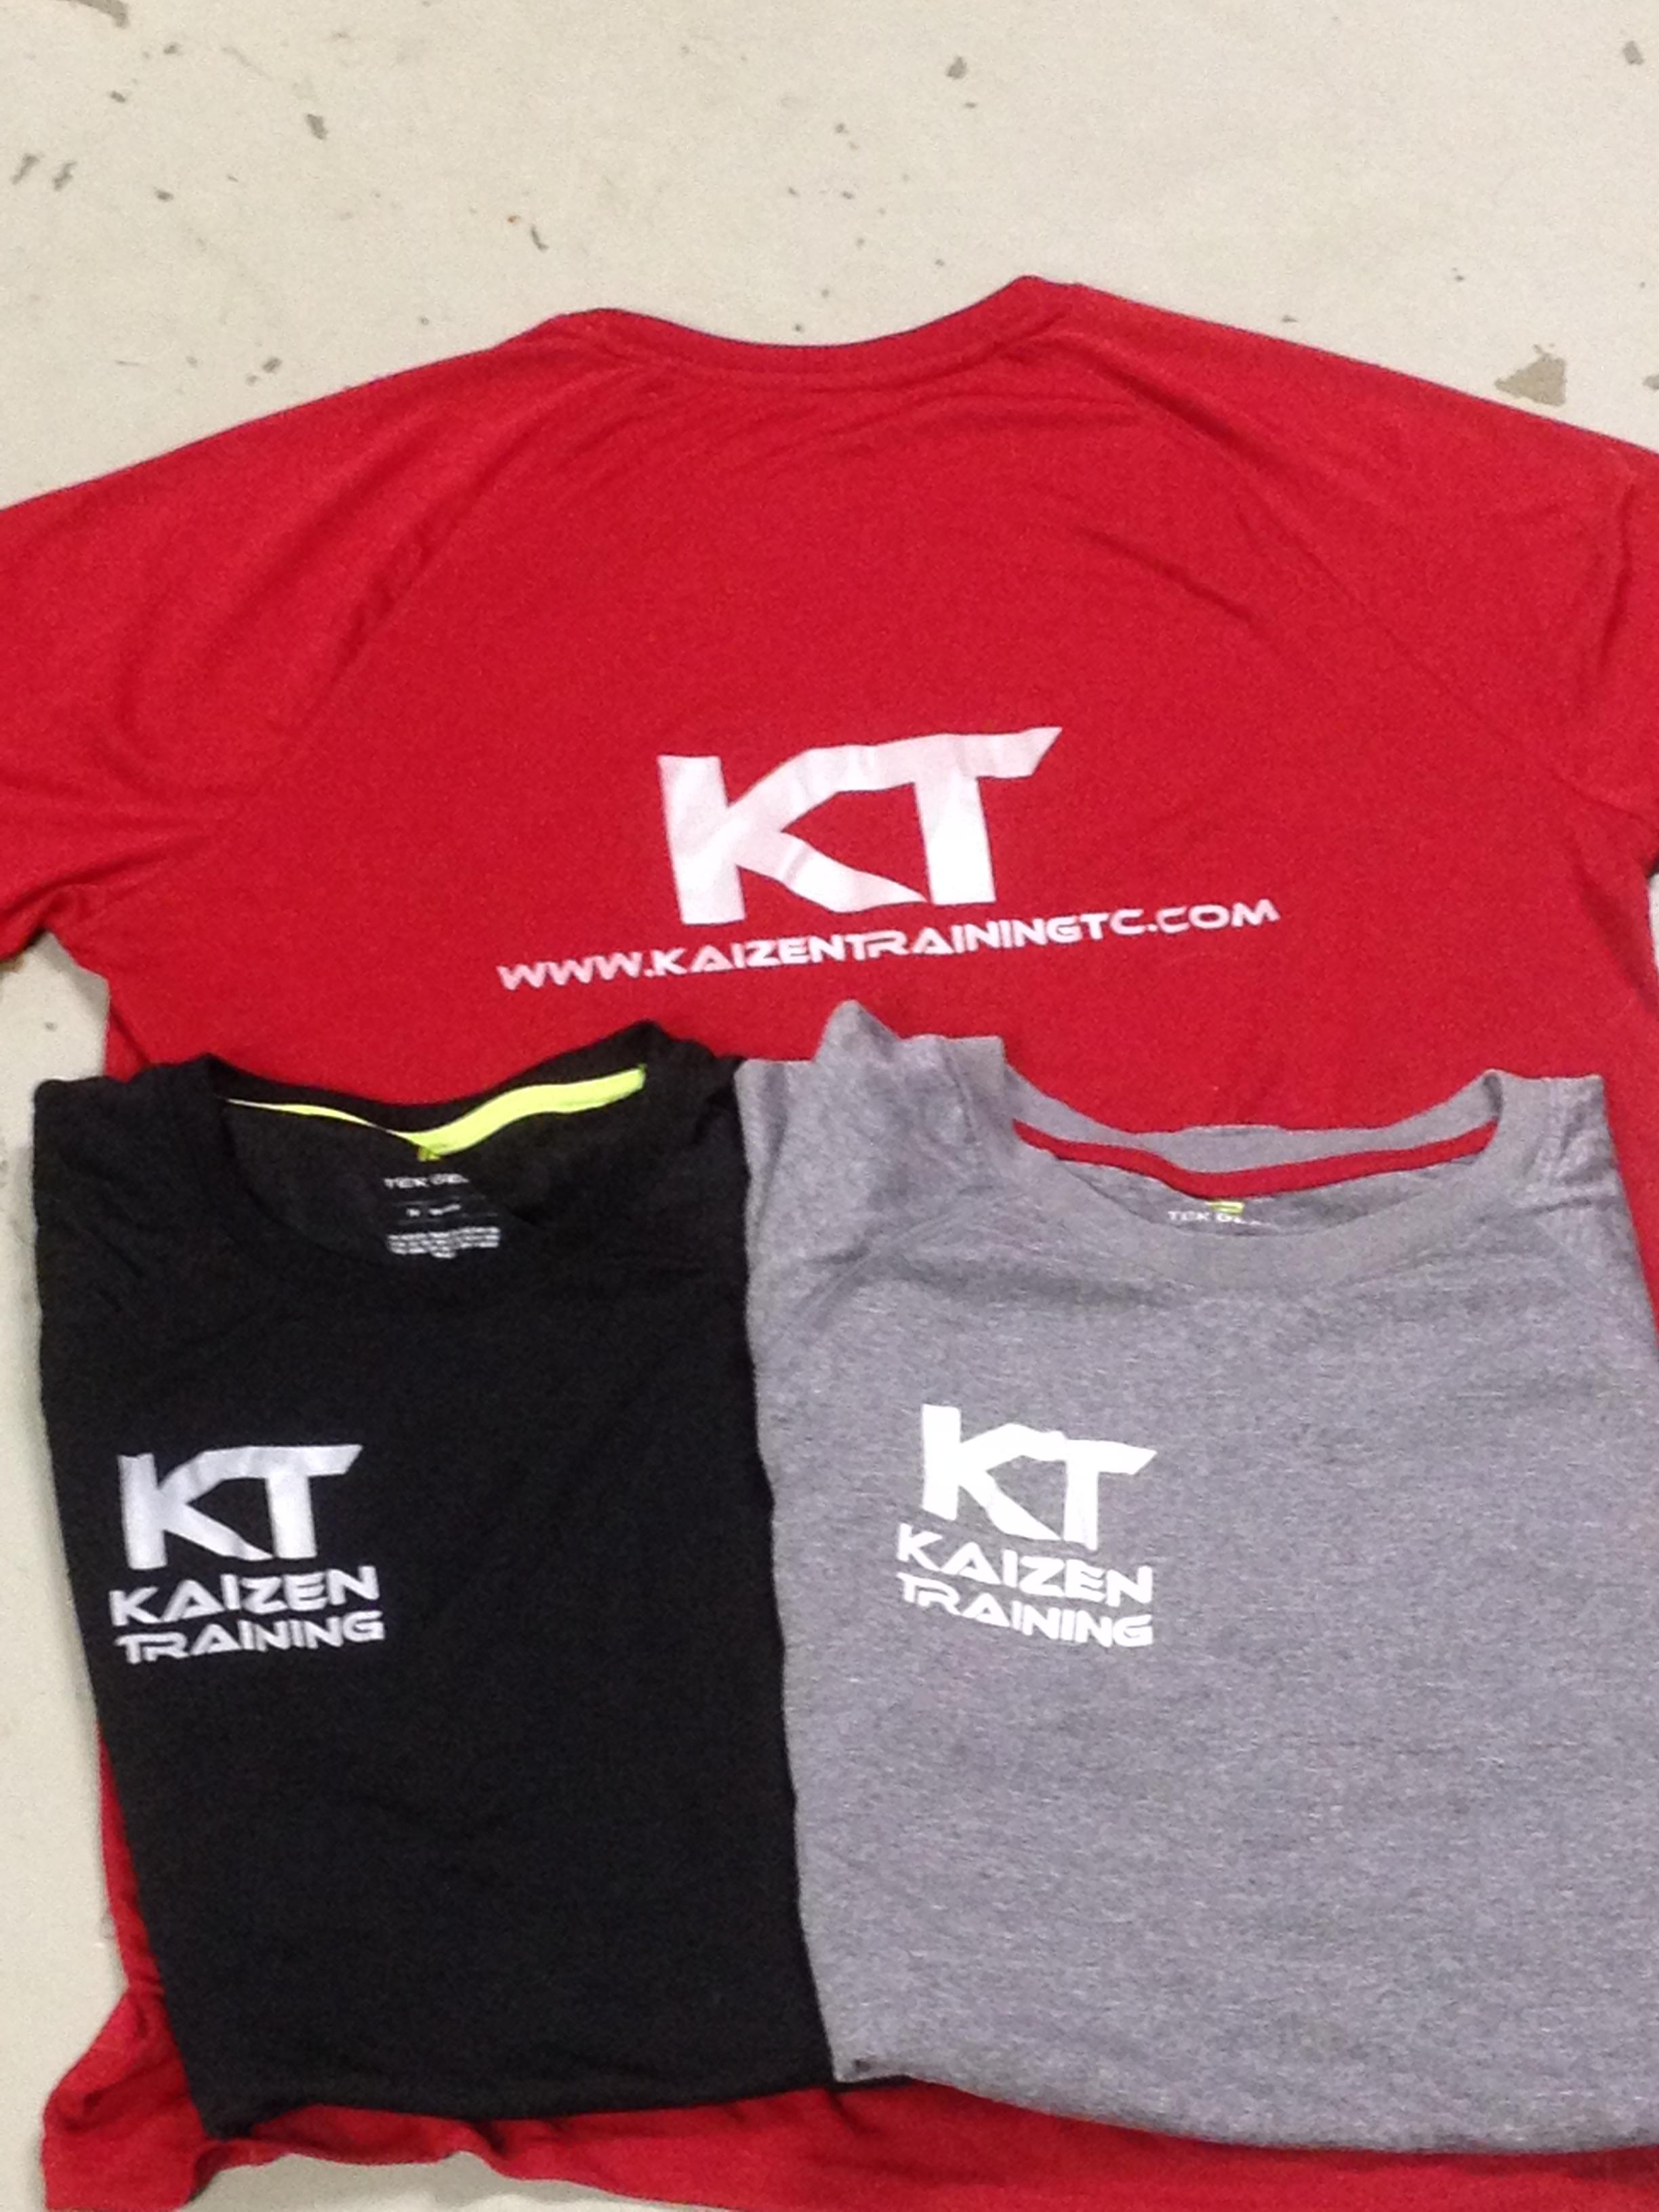 KT Gear is here!